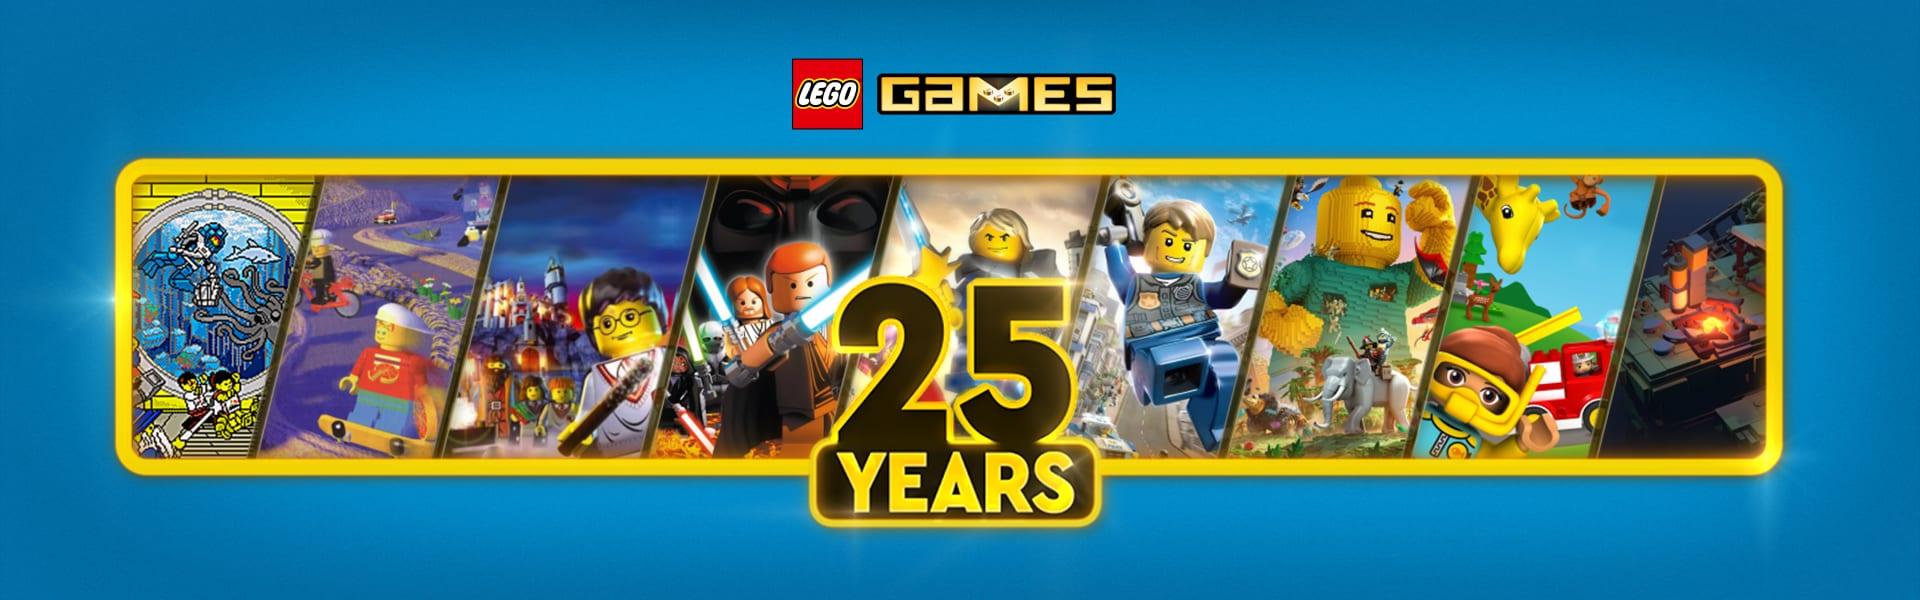 LEGO Bits N' Bricks